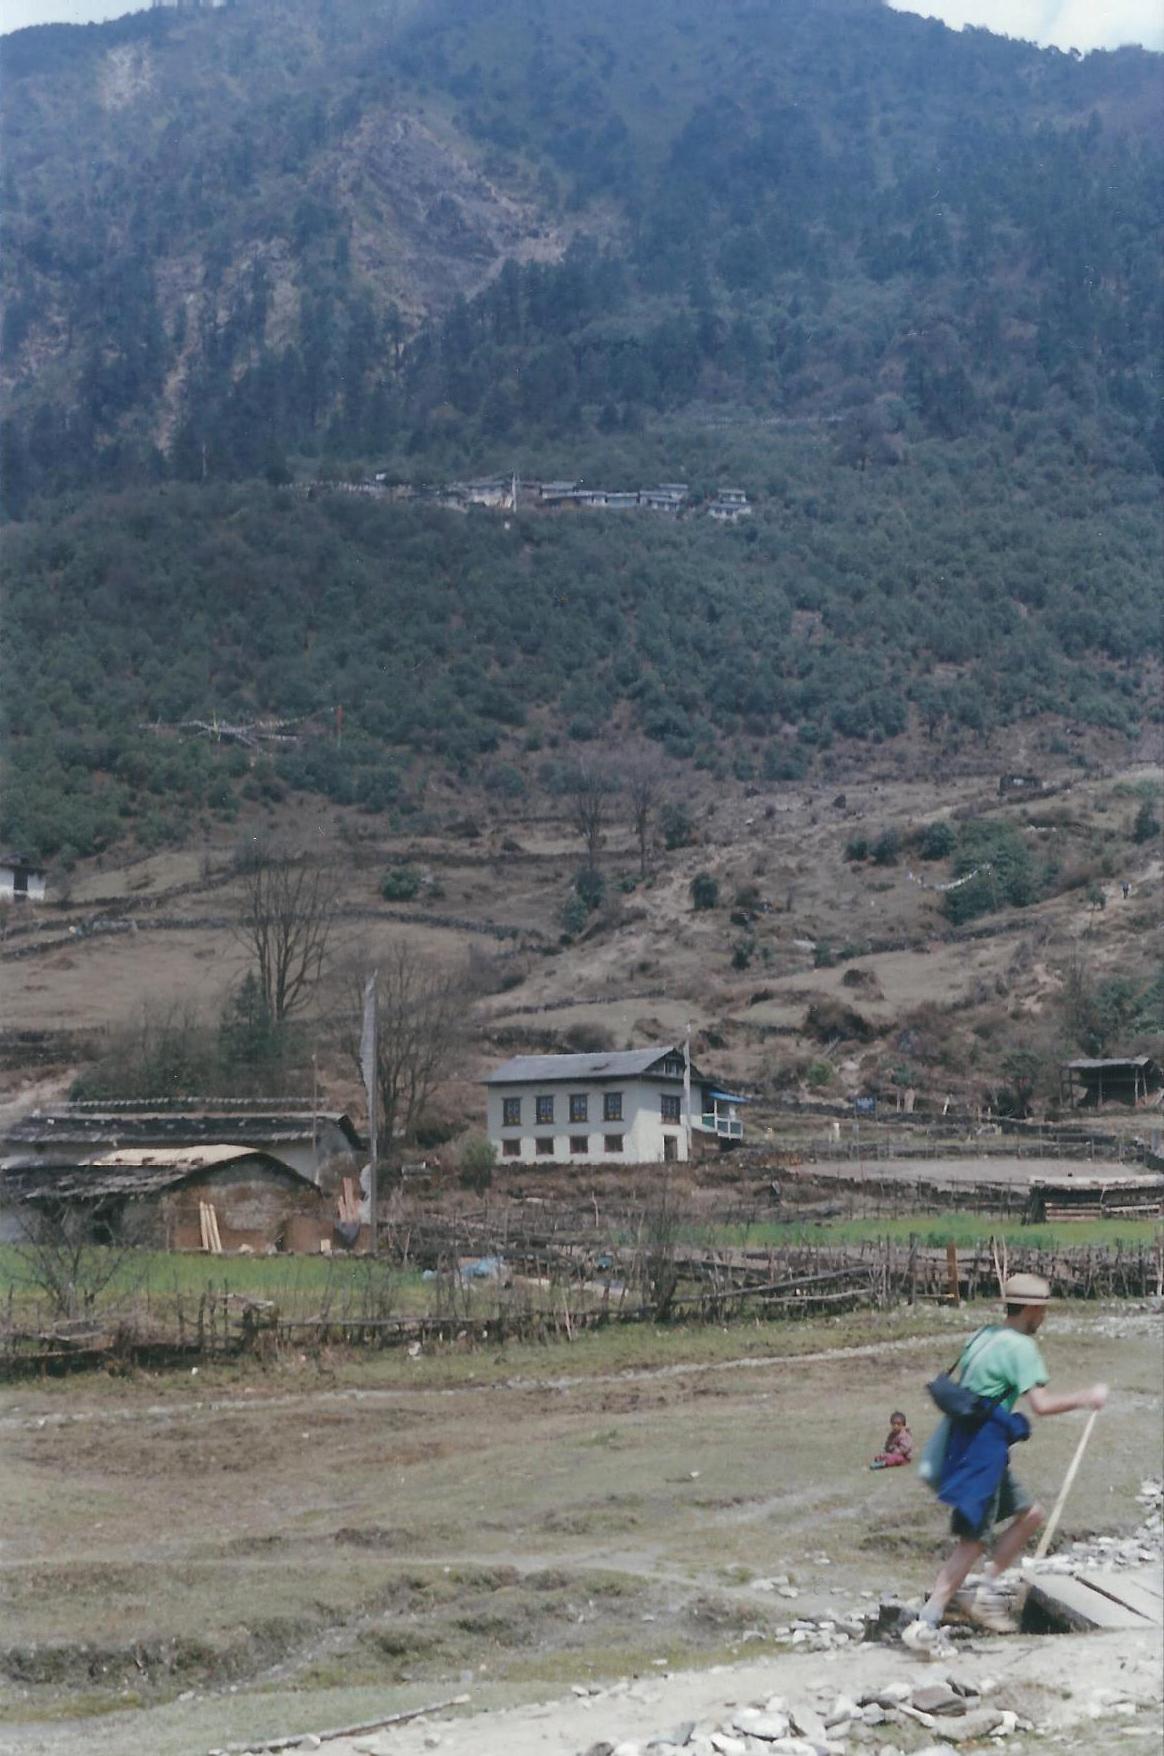 Trekker Upper Dolpo Trek Nepal Trekking Hike Hiking Himalayas